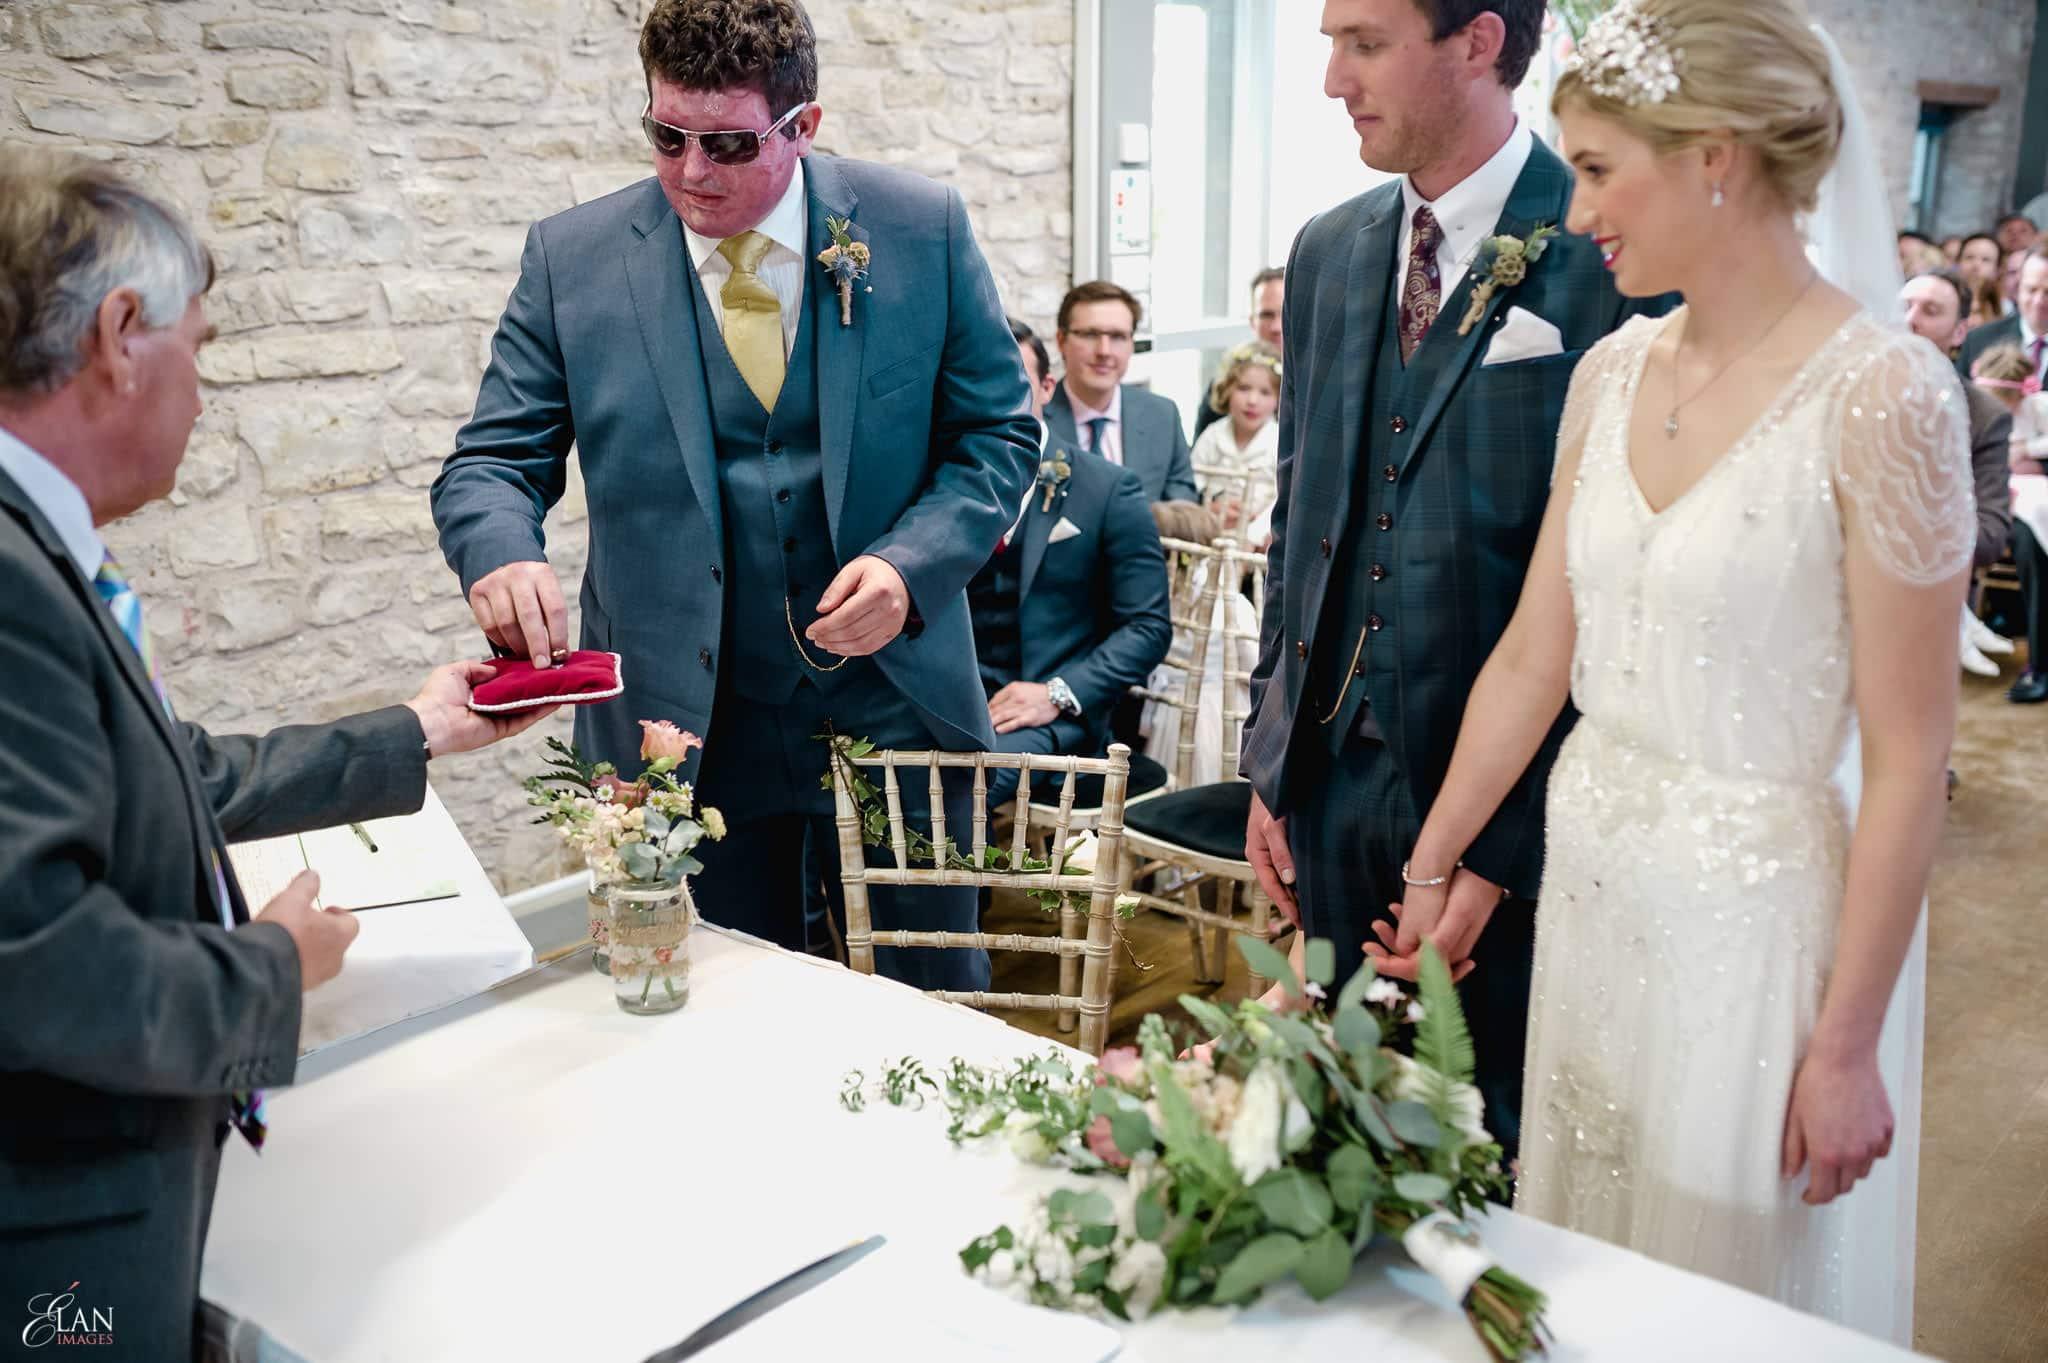 Spring Wedding at the Folly Farm Centre, Bristol 22